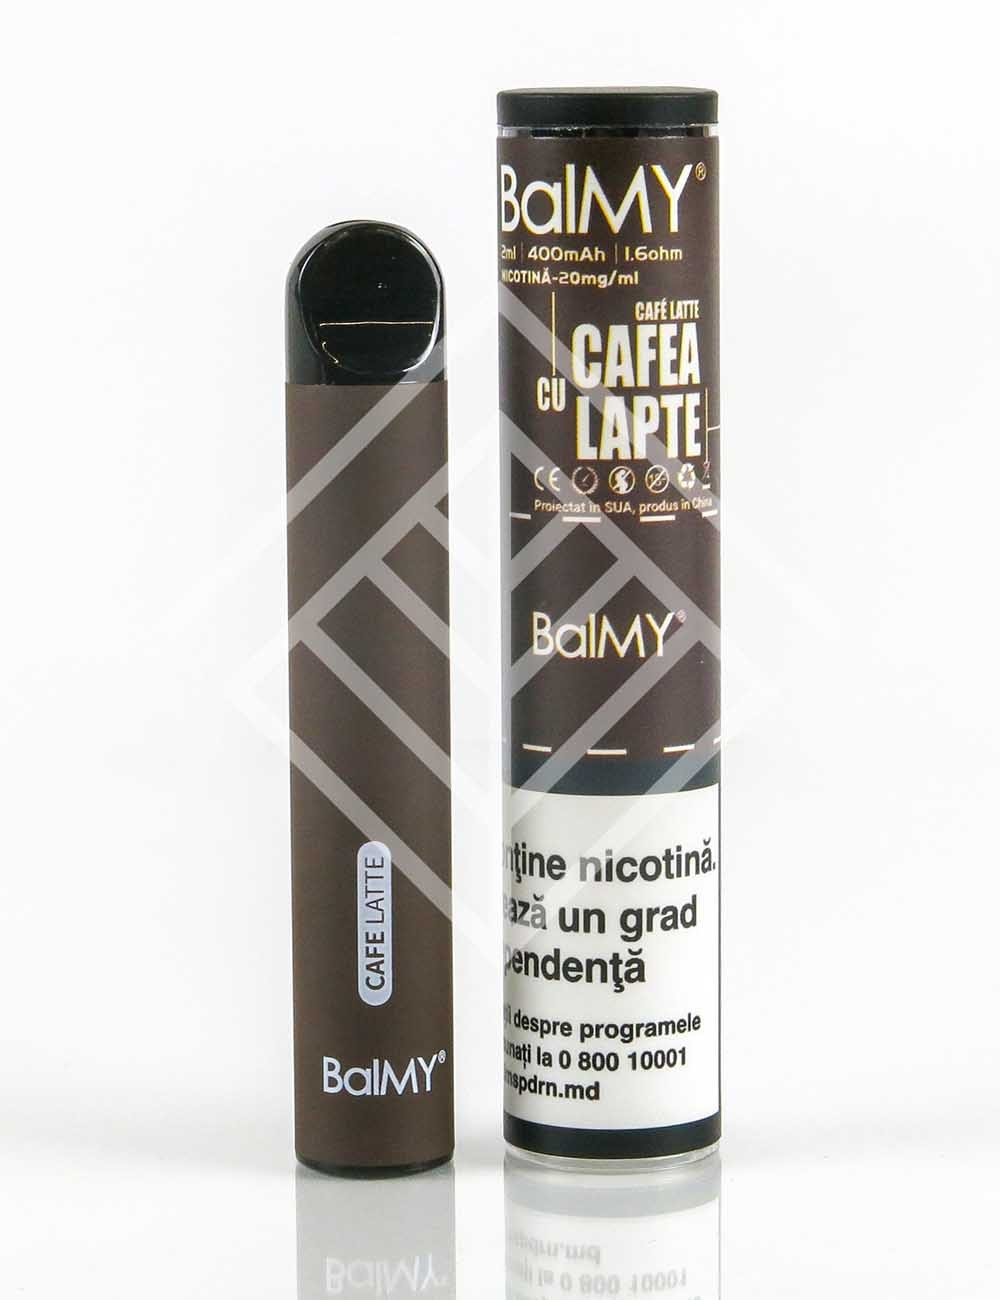 BalMY500 Cafe Latte